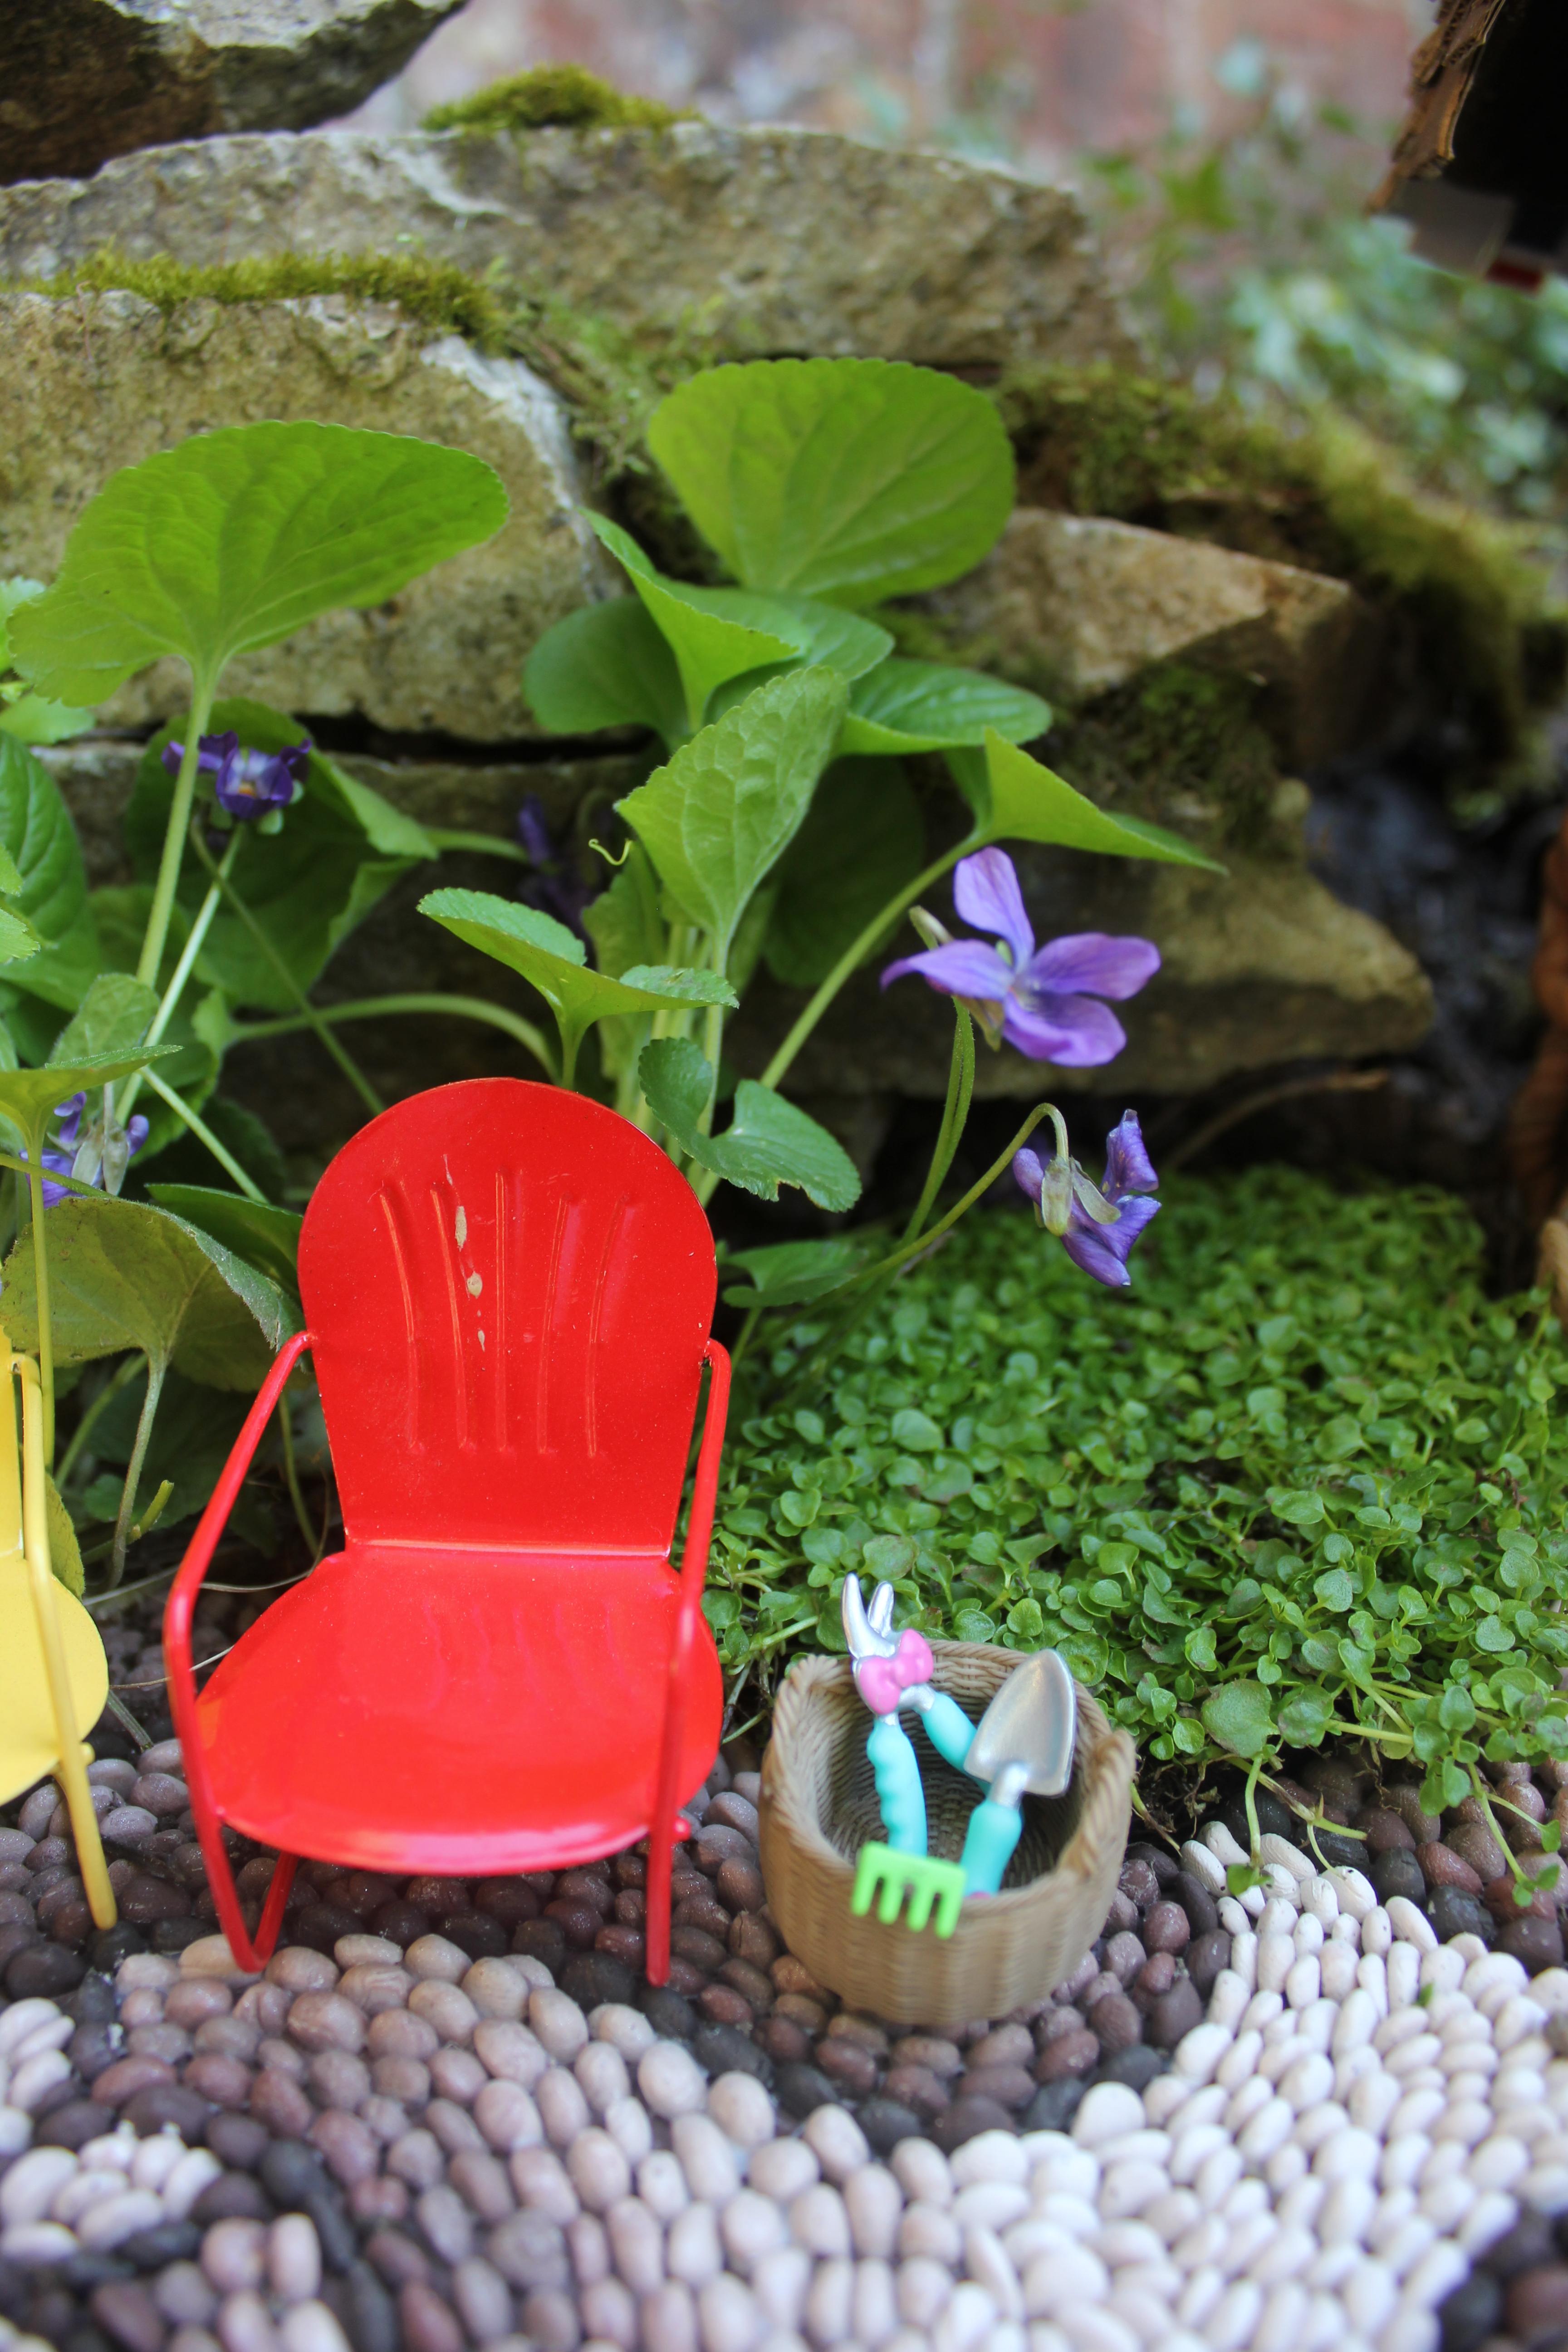 How To Make A Miniature Garden Path Beneath The Ferns